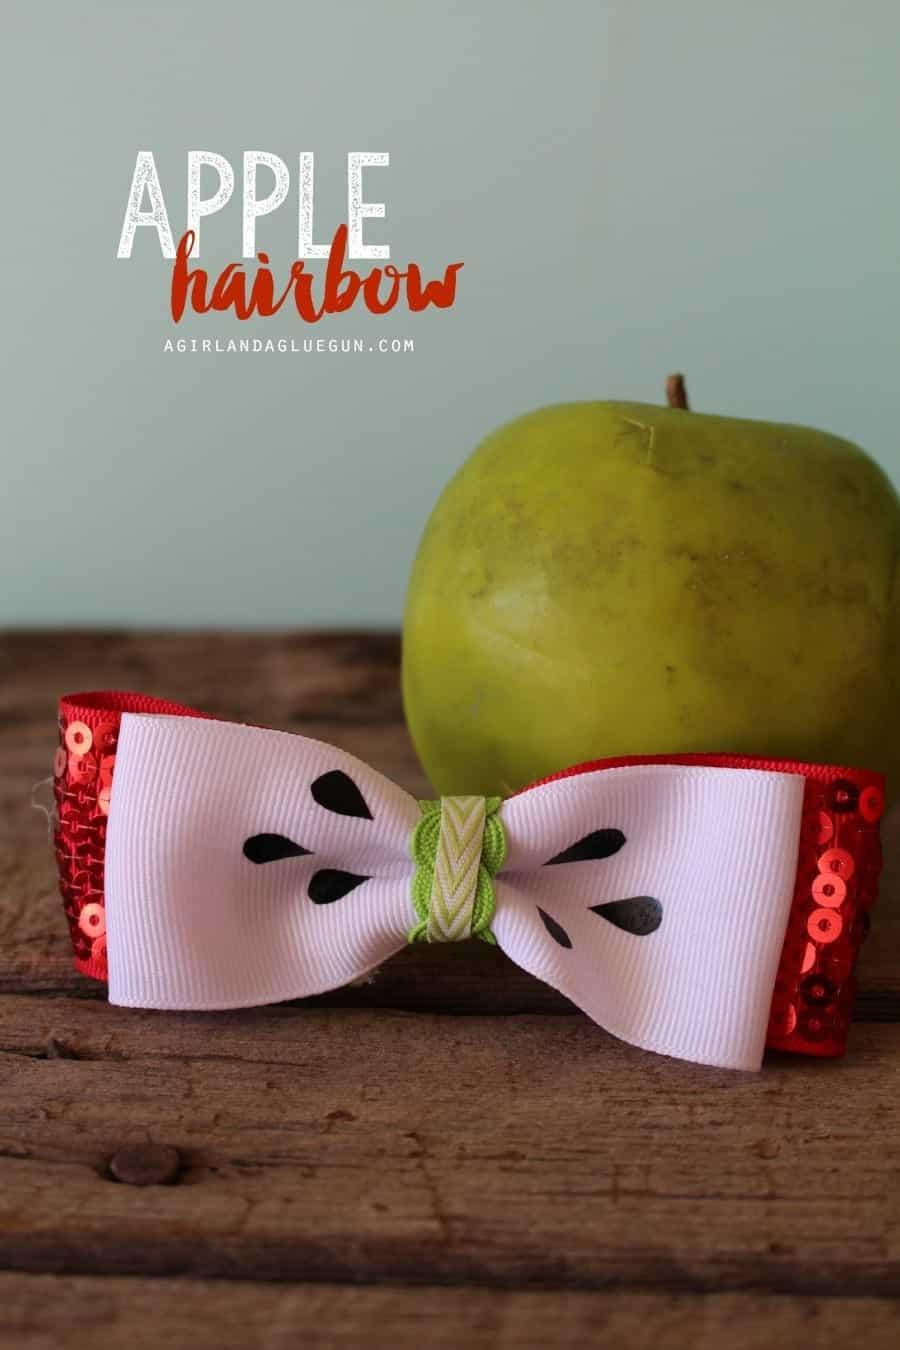 apple-hairbow-900x1350